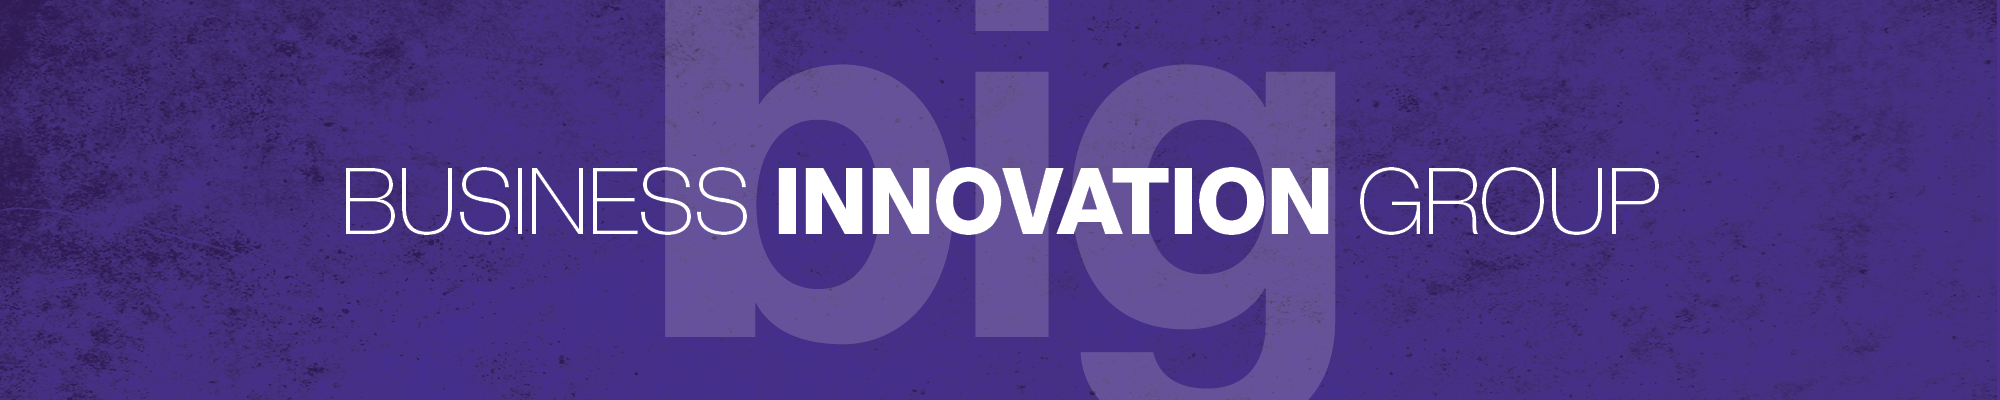 Business Innovation Group logo